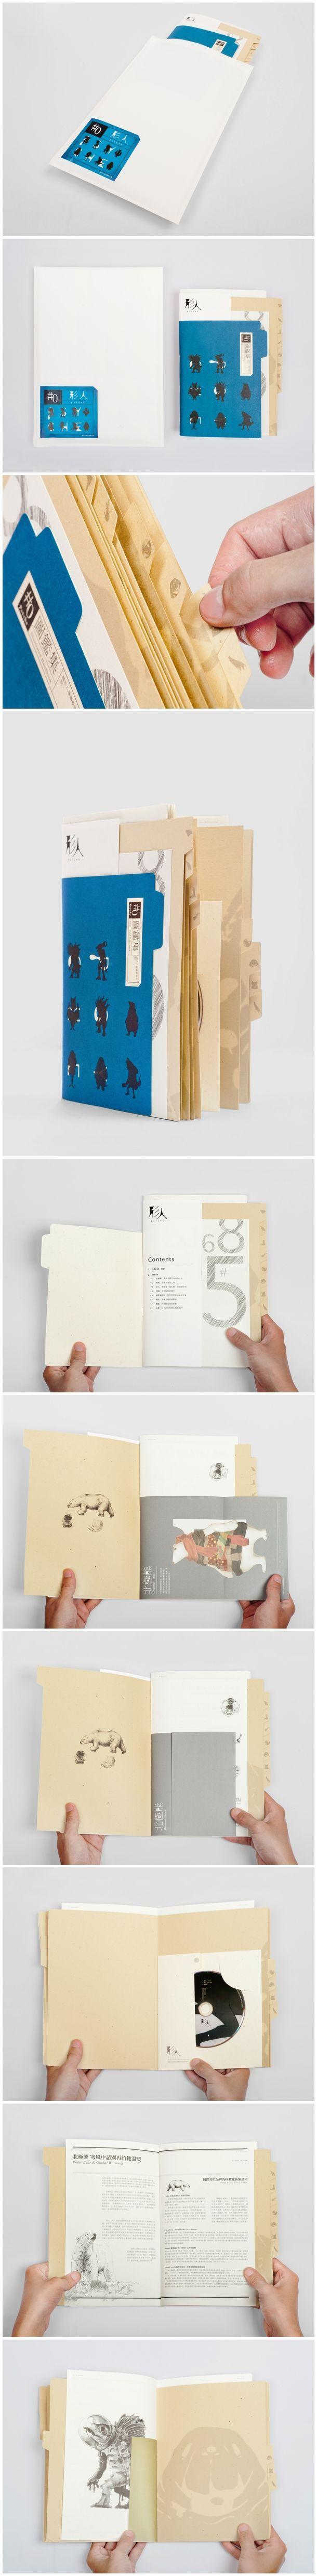 许琪图鉴 / oriental editorial design #experimental #books: